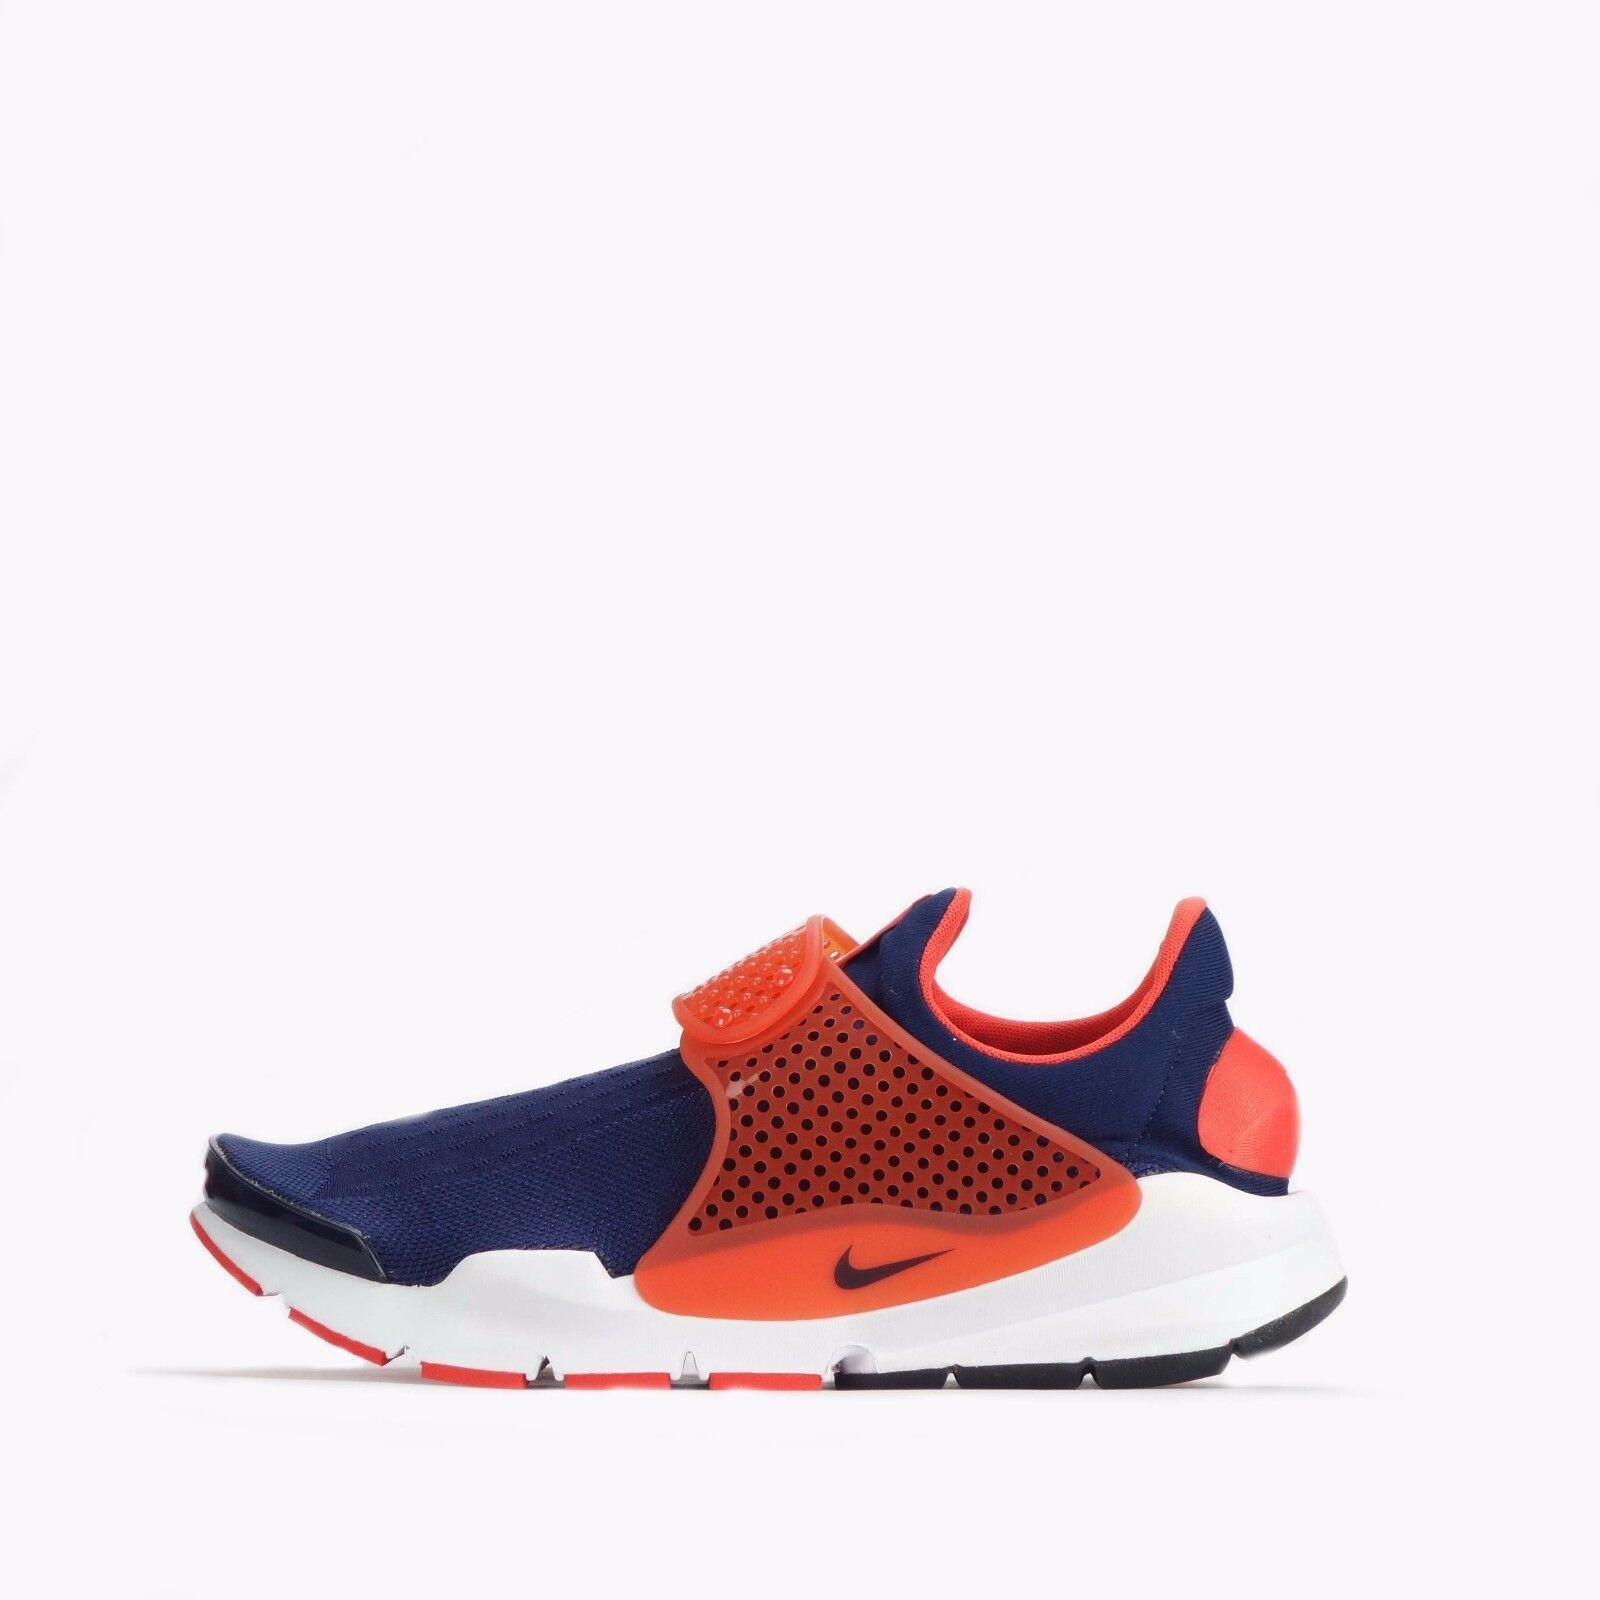 Nike Sock Dart Jacquard Mens Womens Unisex Shoes Midnight Navy/Max Orange